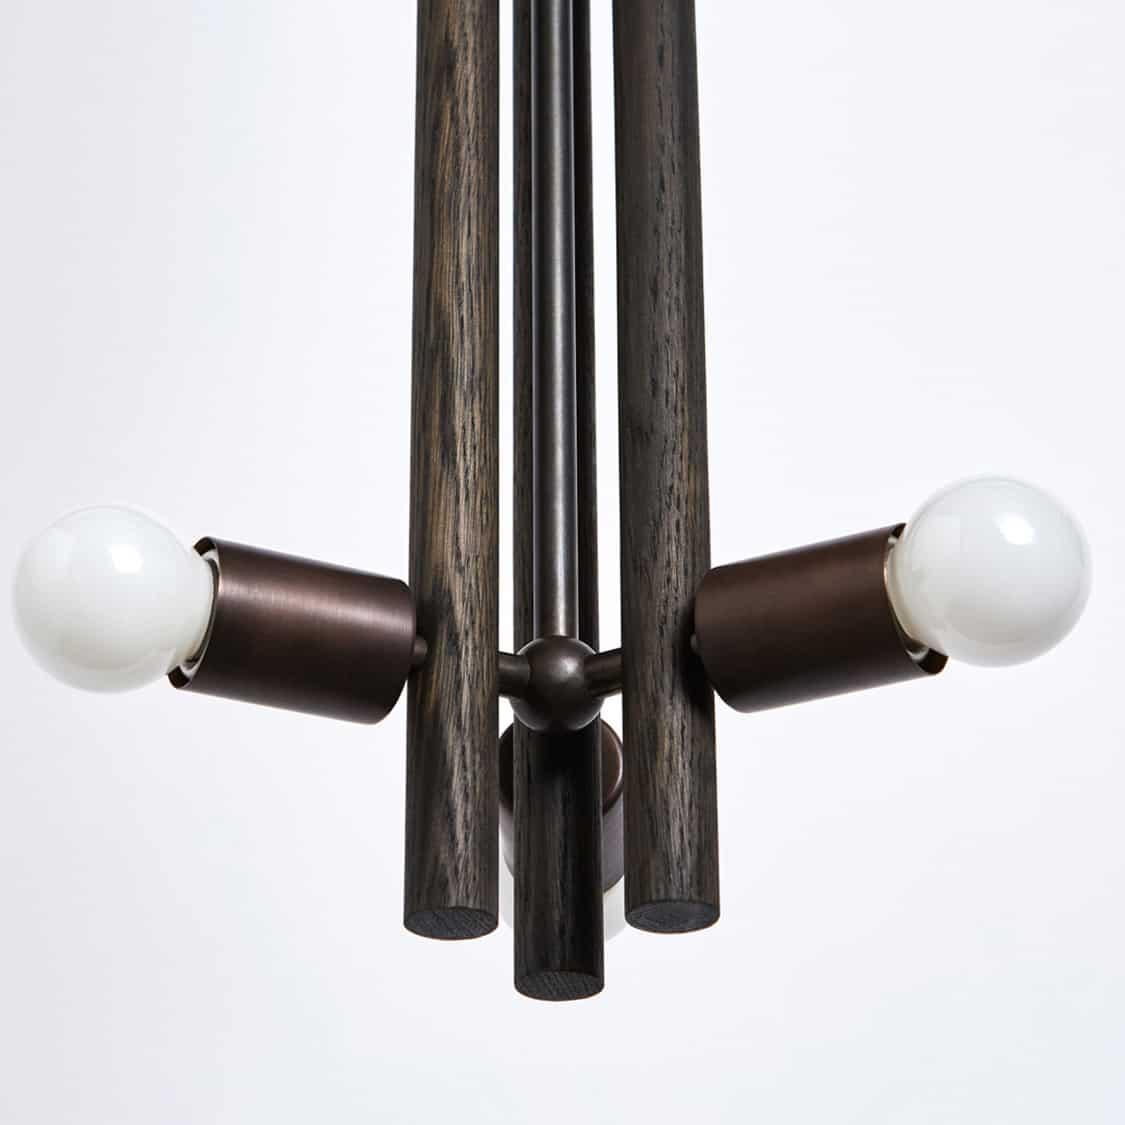 Pendant-Oxidized-Ball-Detail